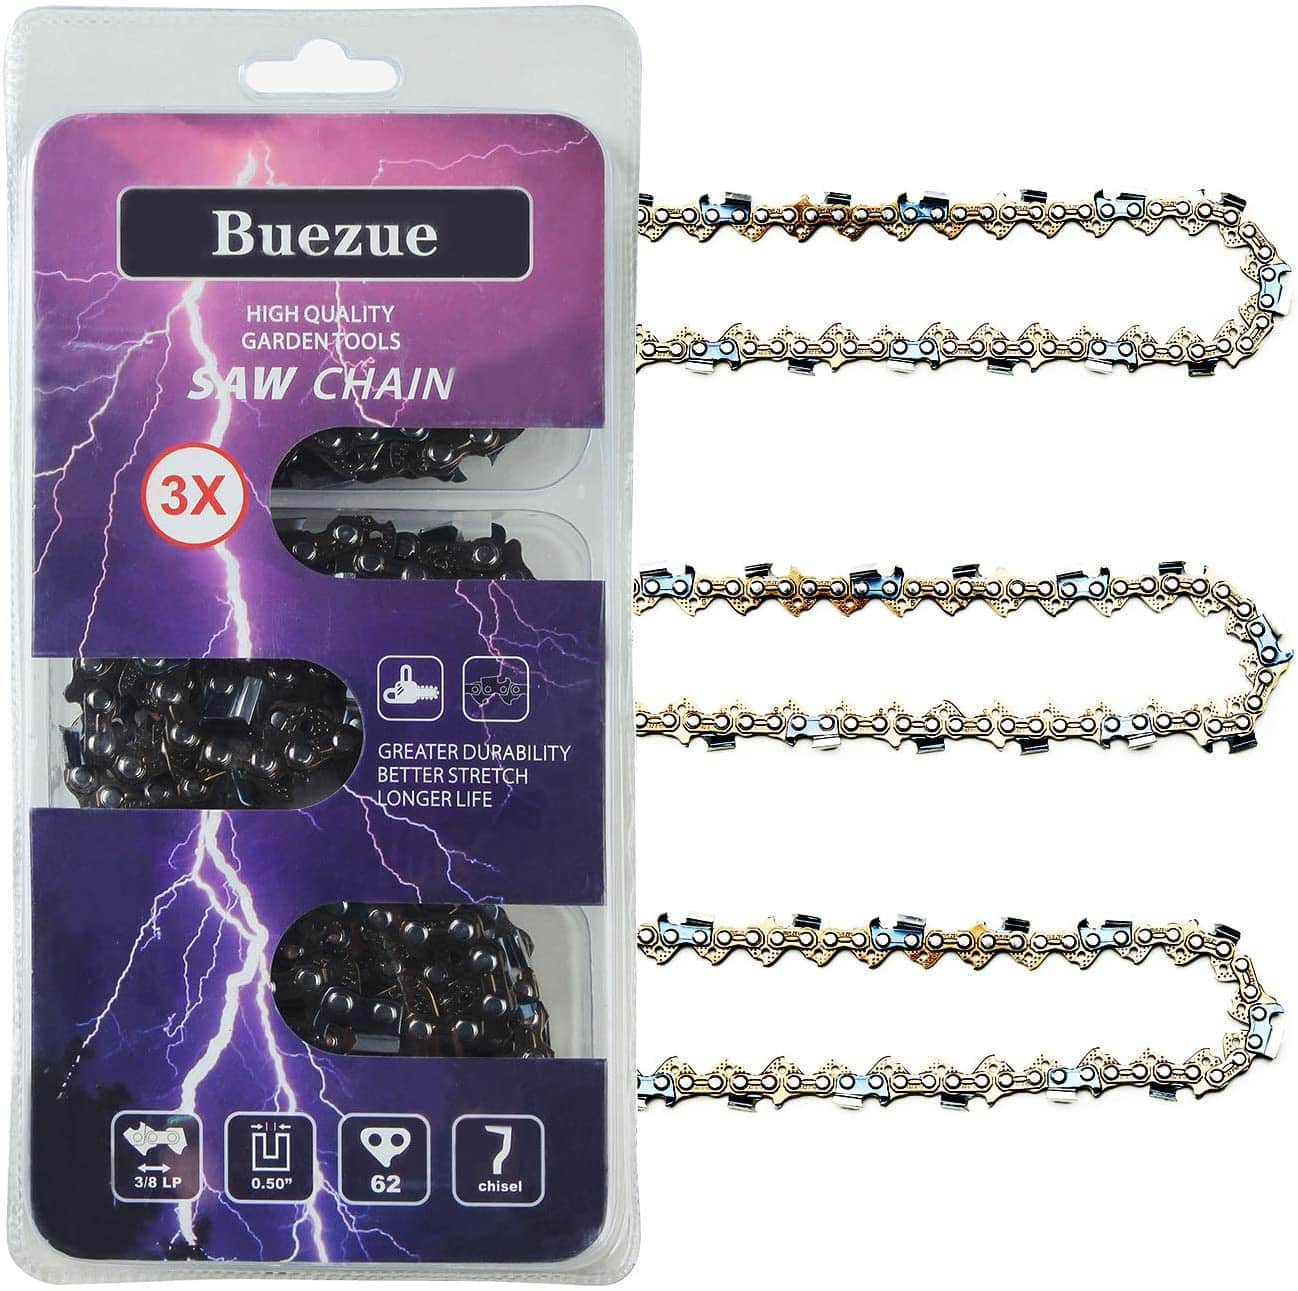 Buezue Saw Chain of Chainsaws 18-inch